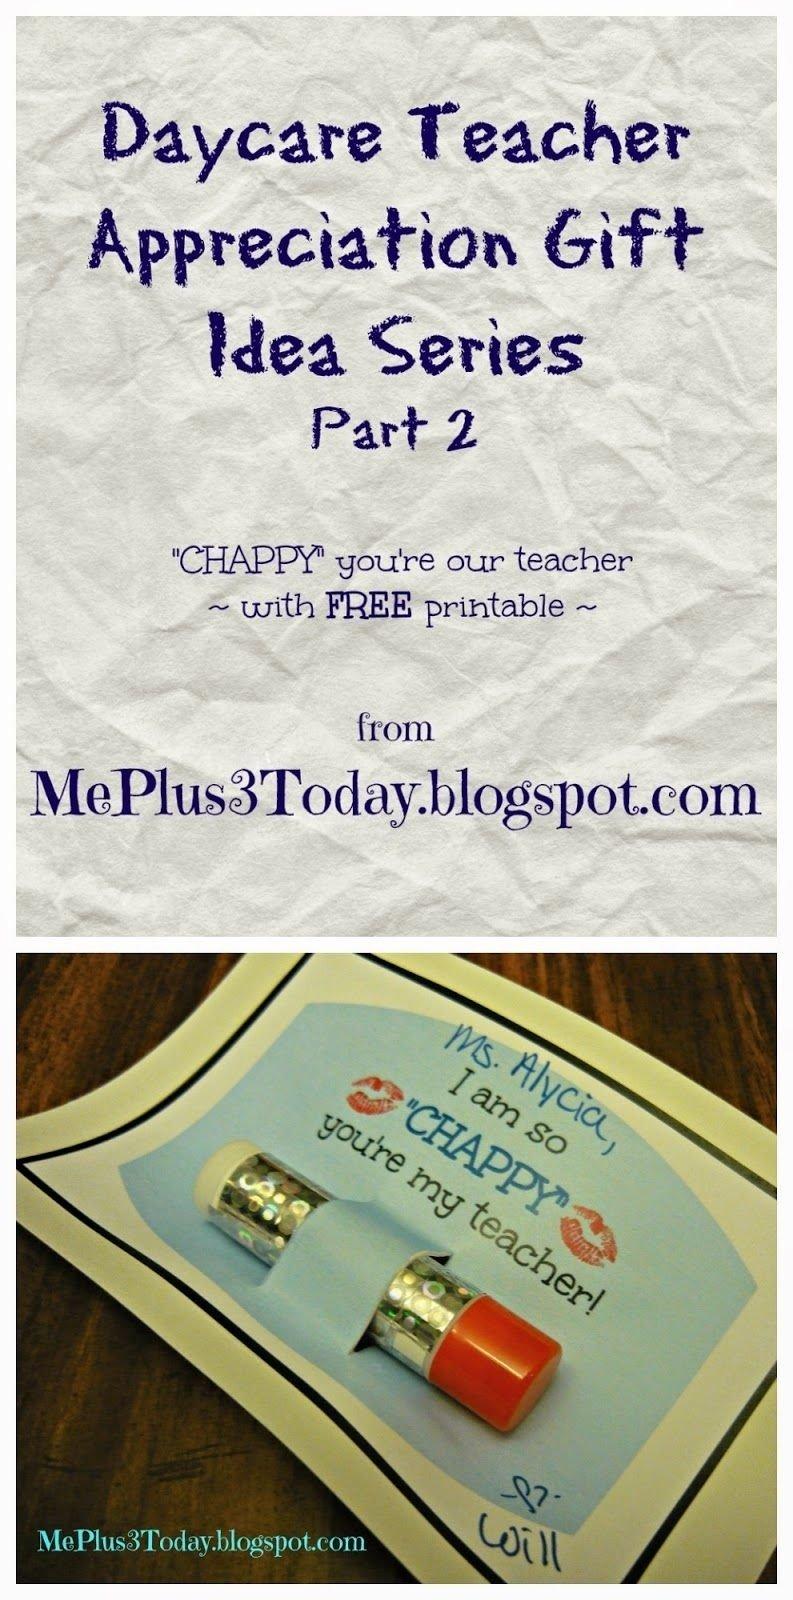 10 Pretty Daycare Teacher Appreciation Gift Ideas a simple teacher appreciation gift idea appreciation gifts 2020